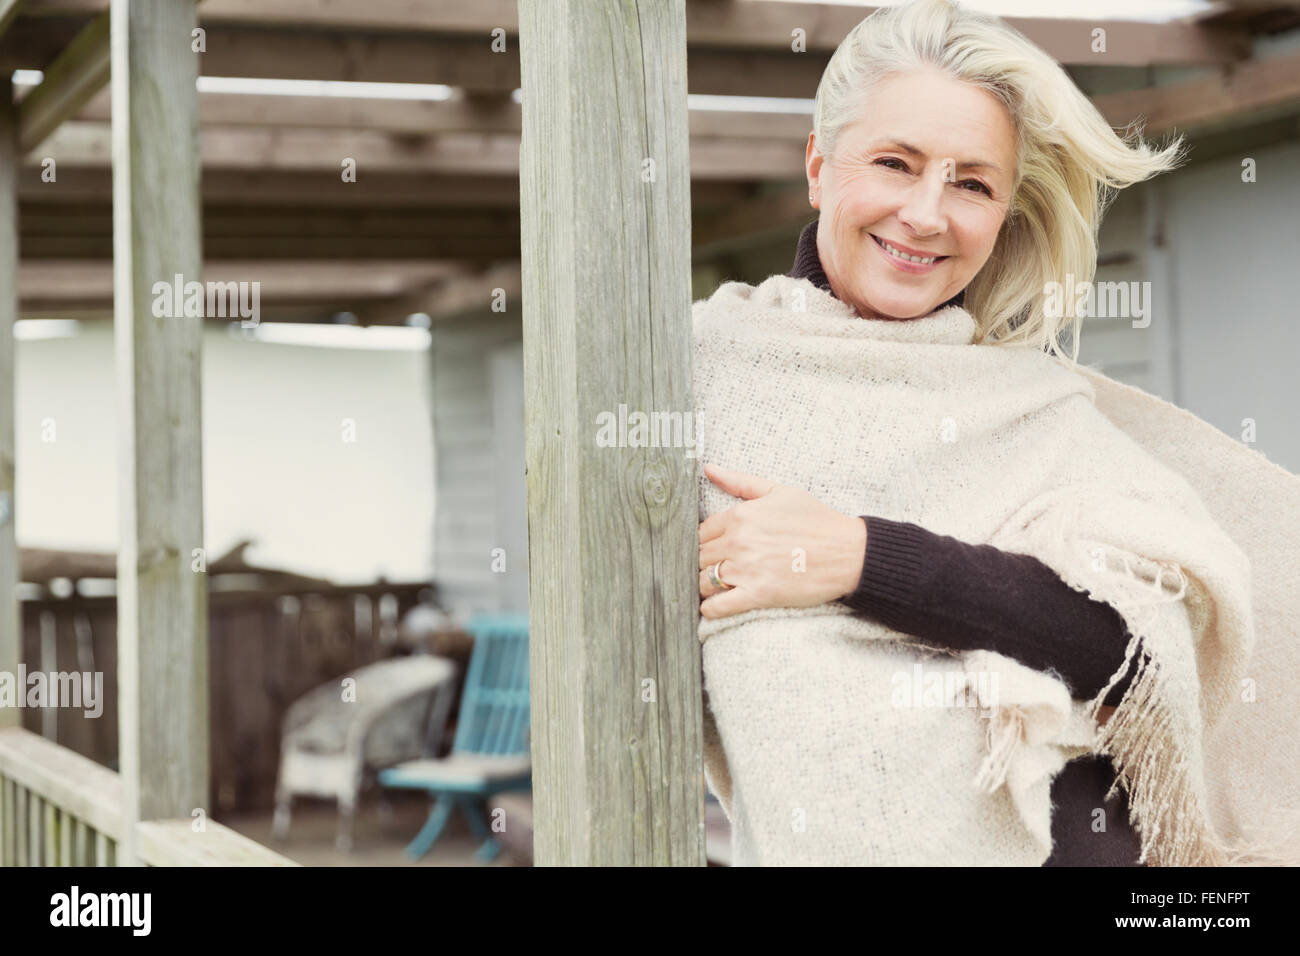 Portrait smiling senior woman wearing shawl on windy porch - Stock Image